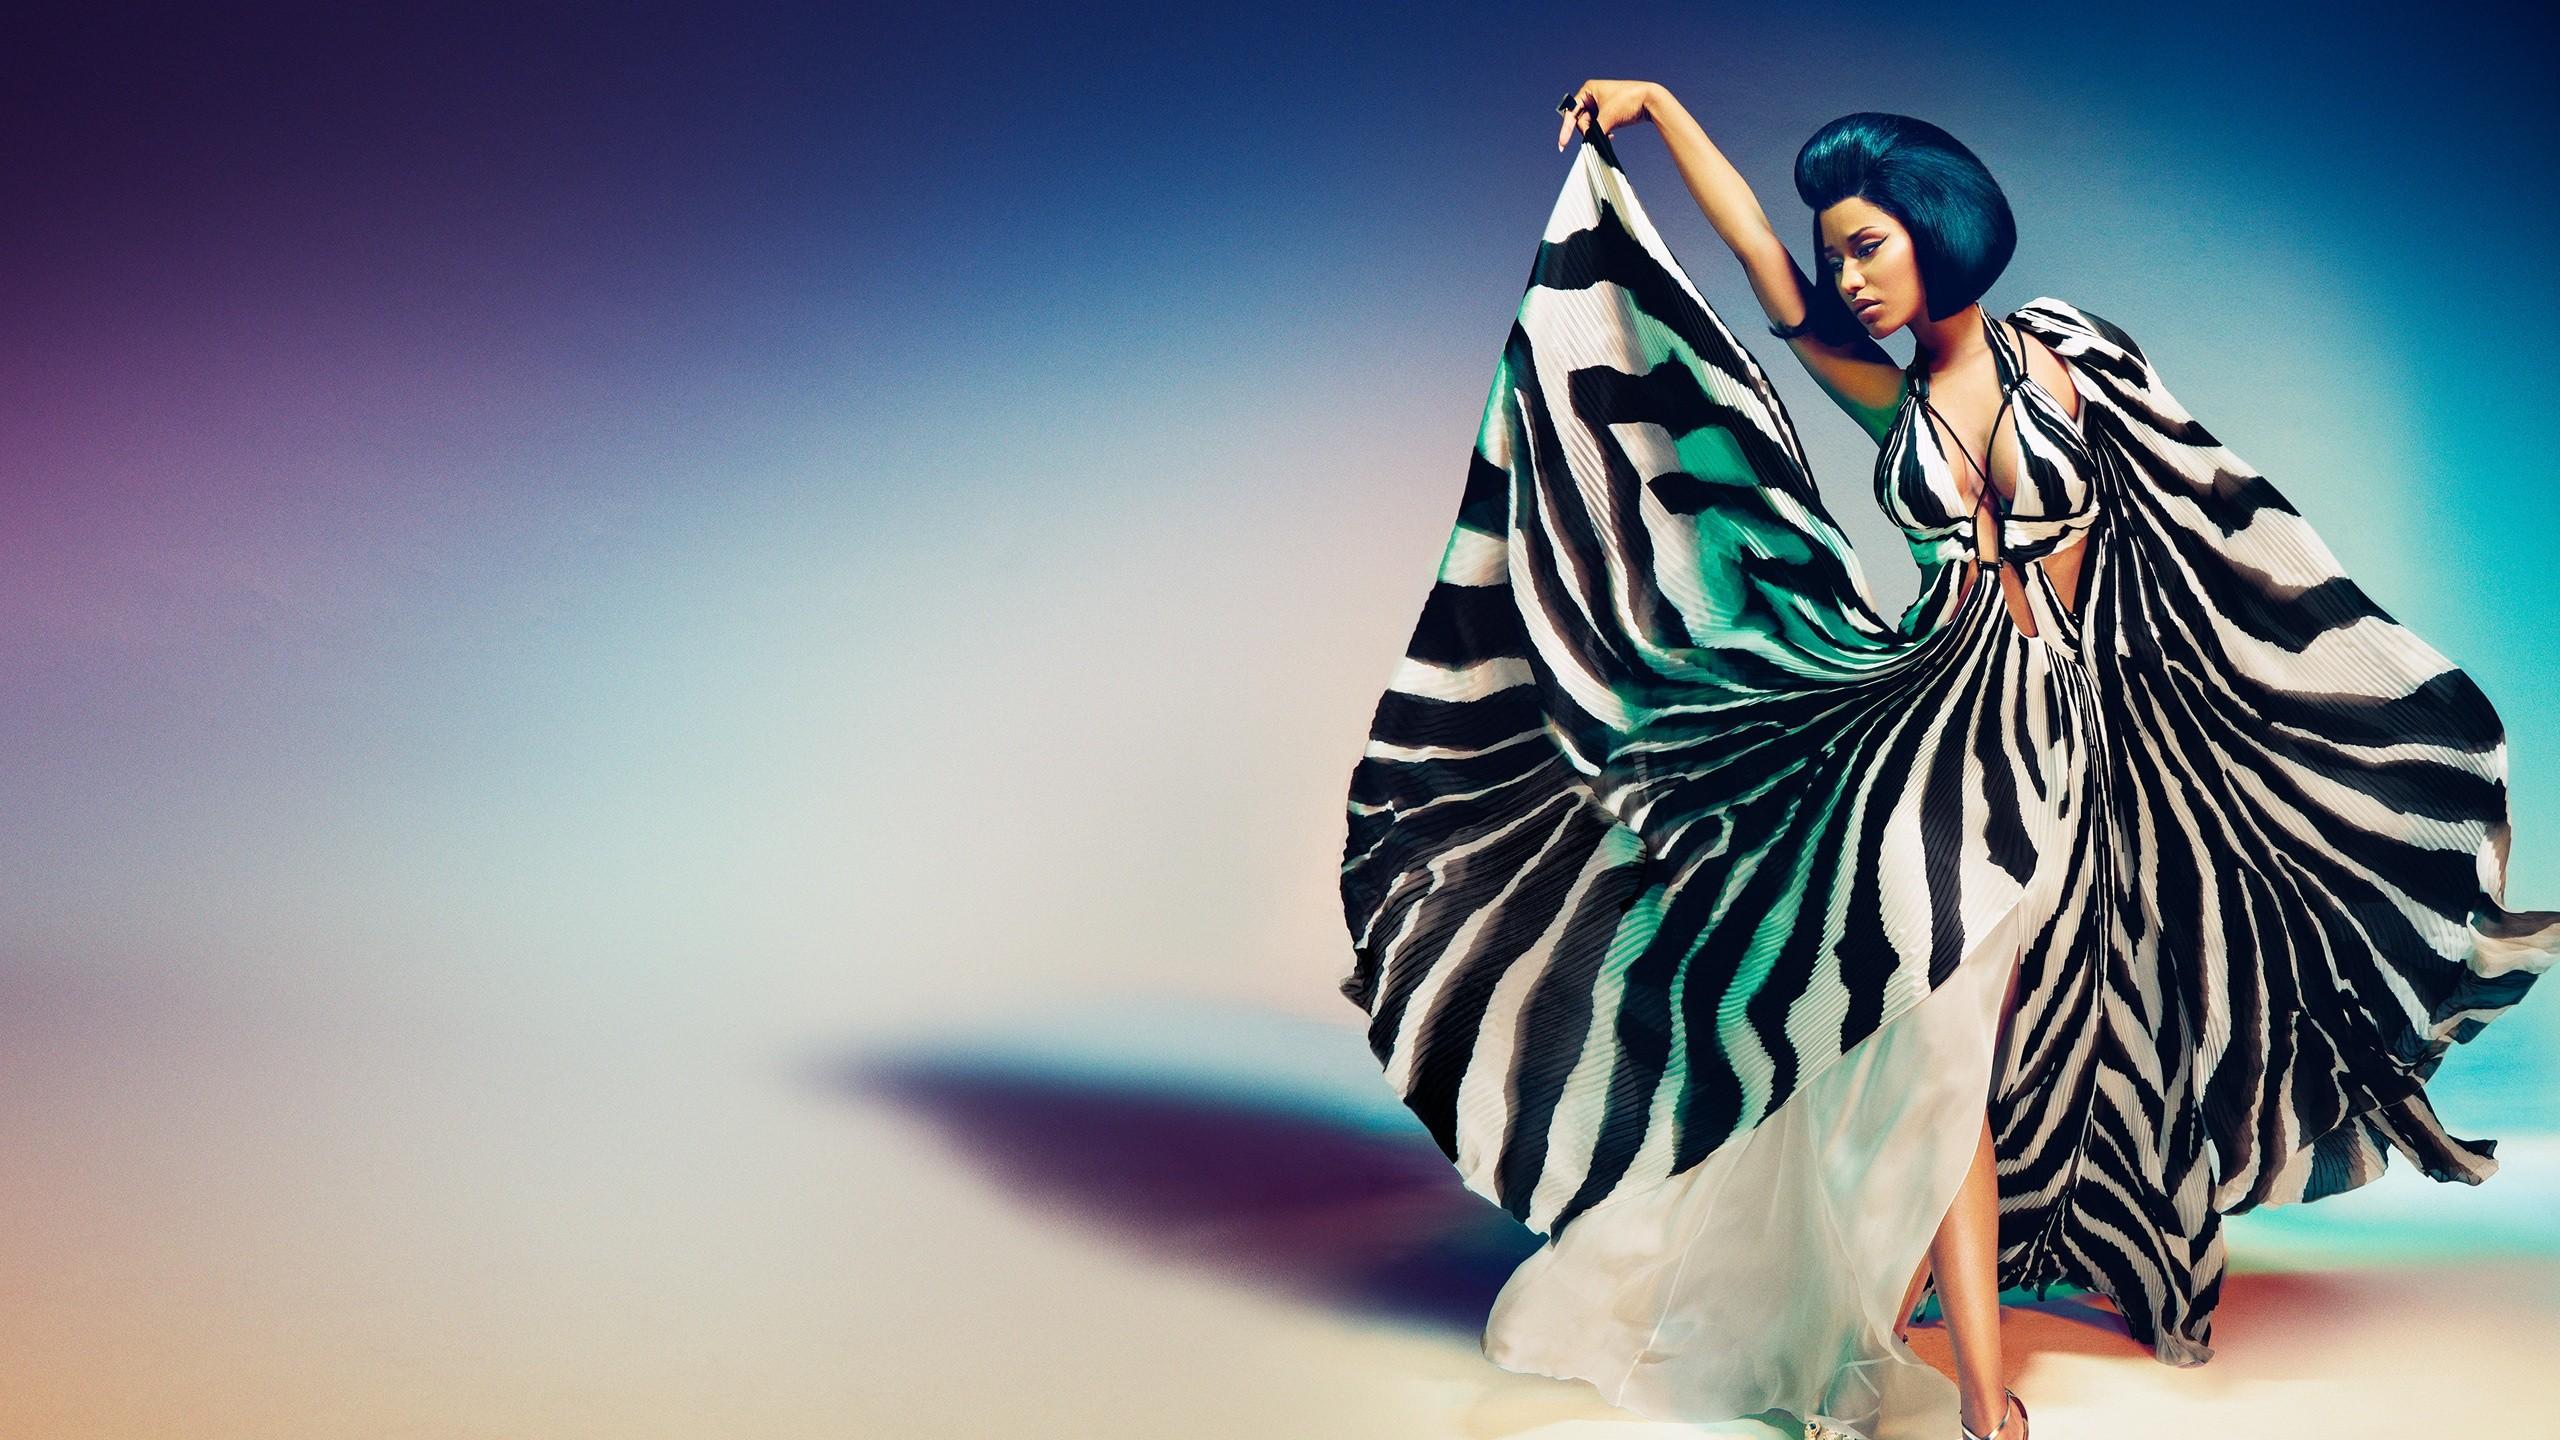 Wallpaper Illustration Women Blue Nicki Minaj Color